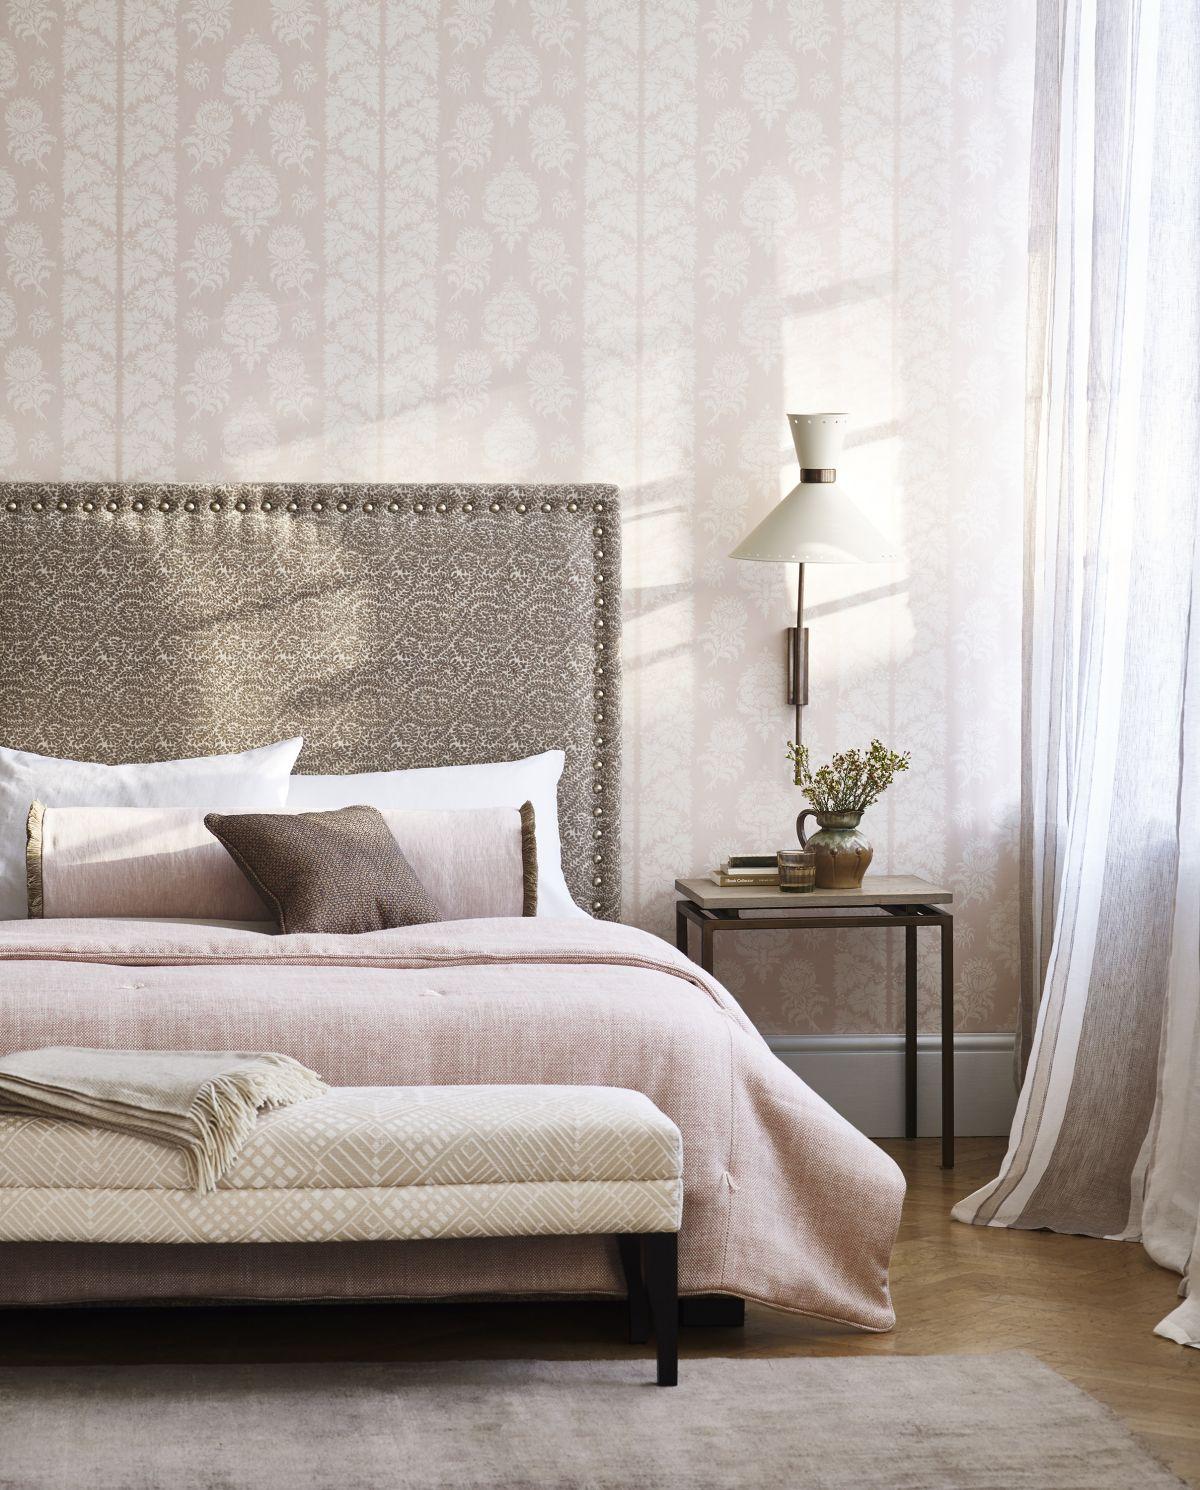 Bedroom Curtain Ideas: 16 Curtain Designs For Beautiful